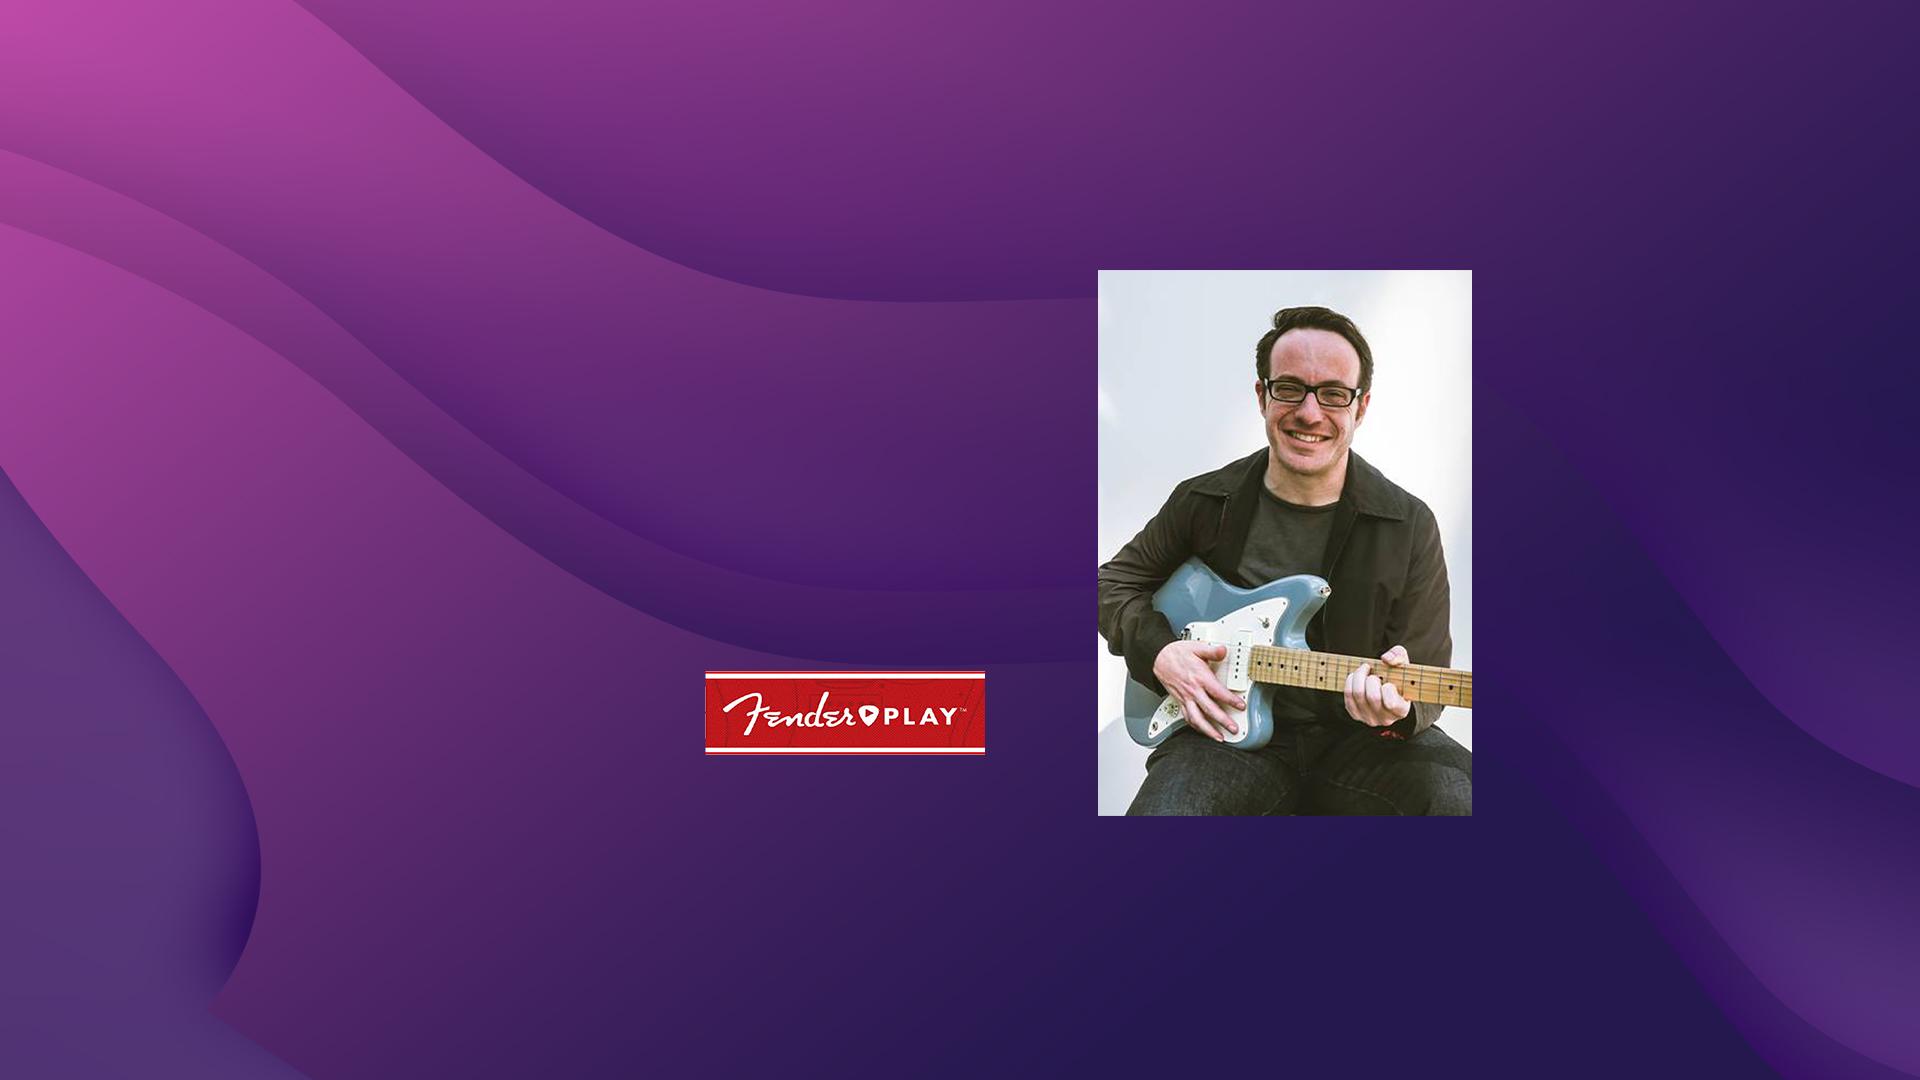 828: Fender Play – A Digital Transformation Story